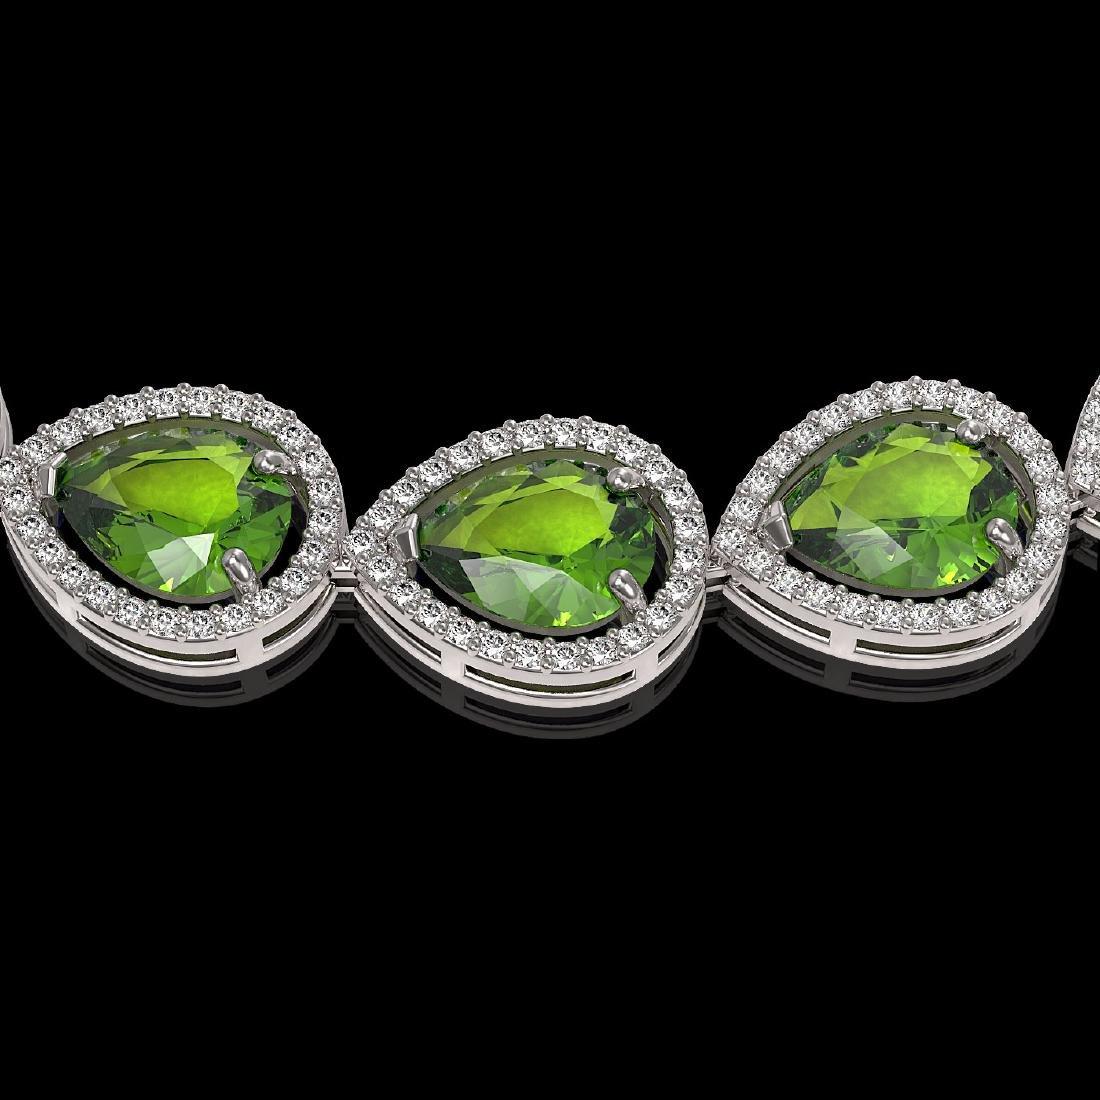 33.6 CTW Peridot & Diamond Halo Necklace 10K White Gold - 3